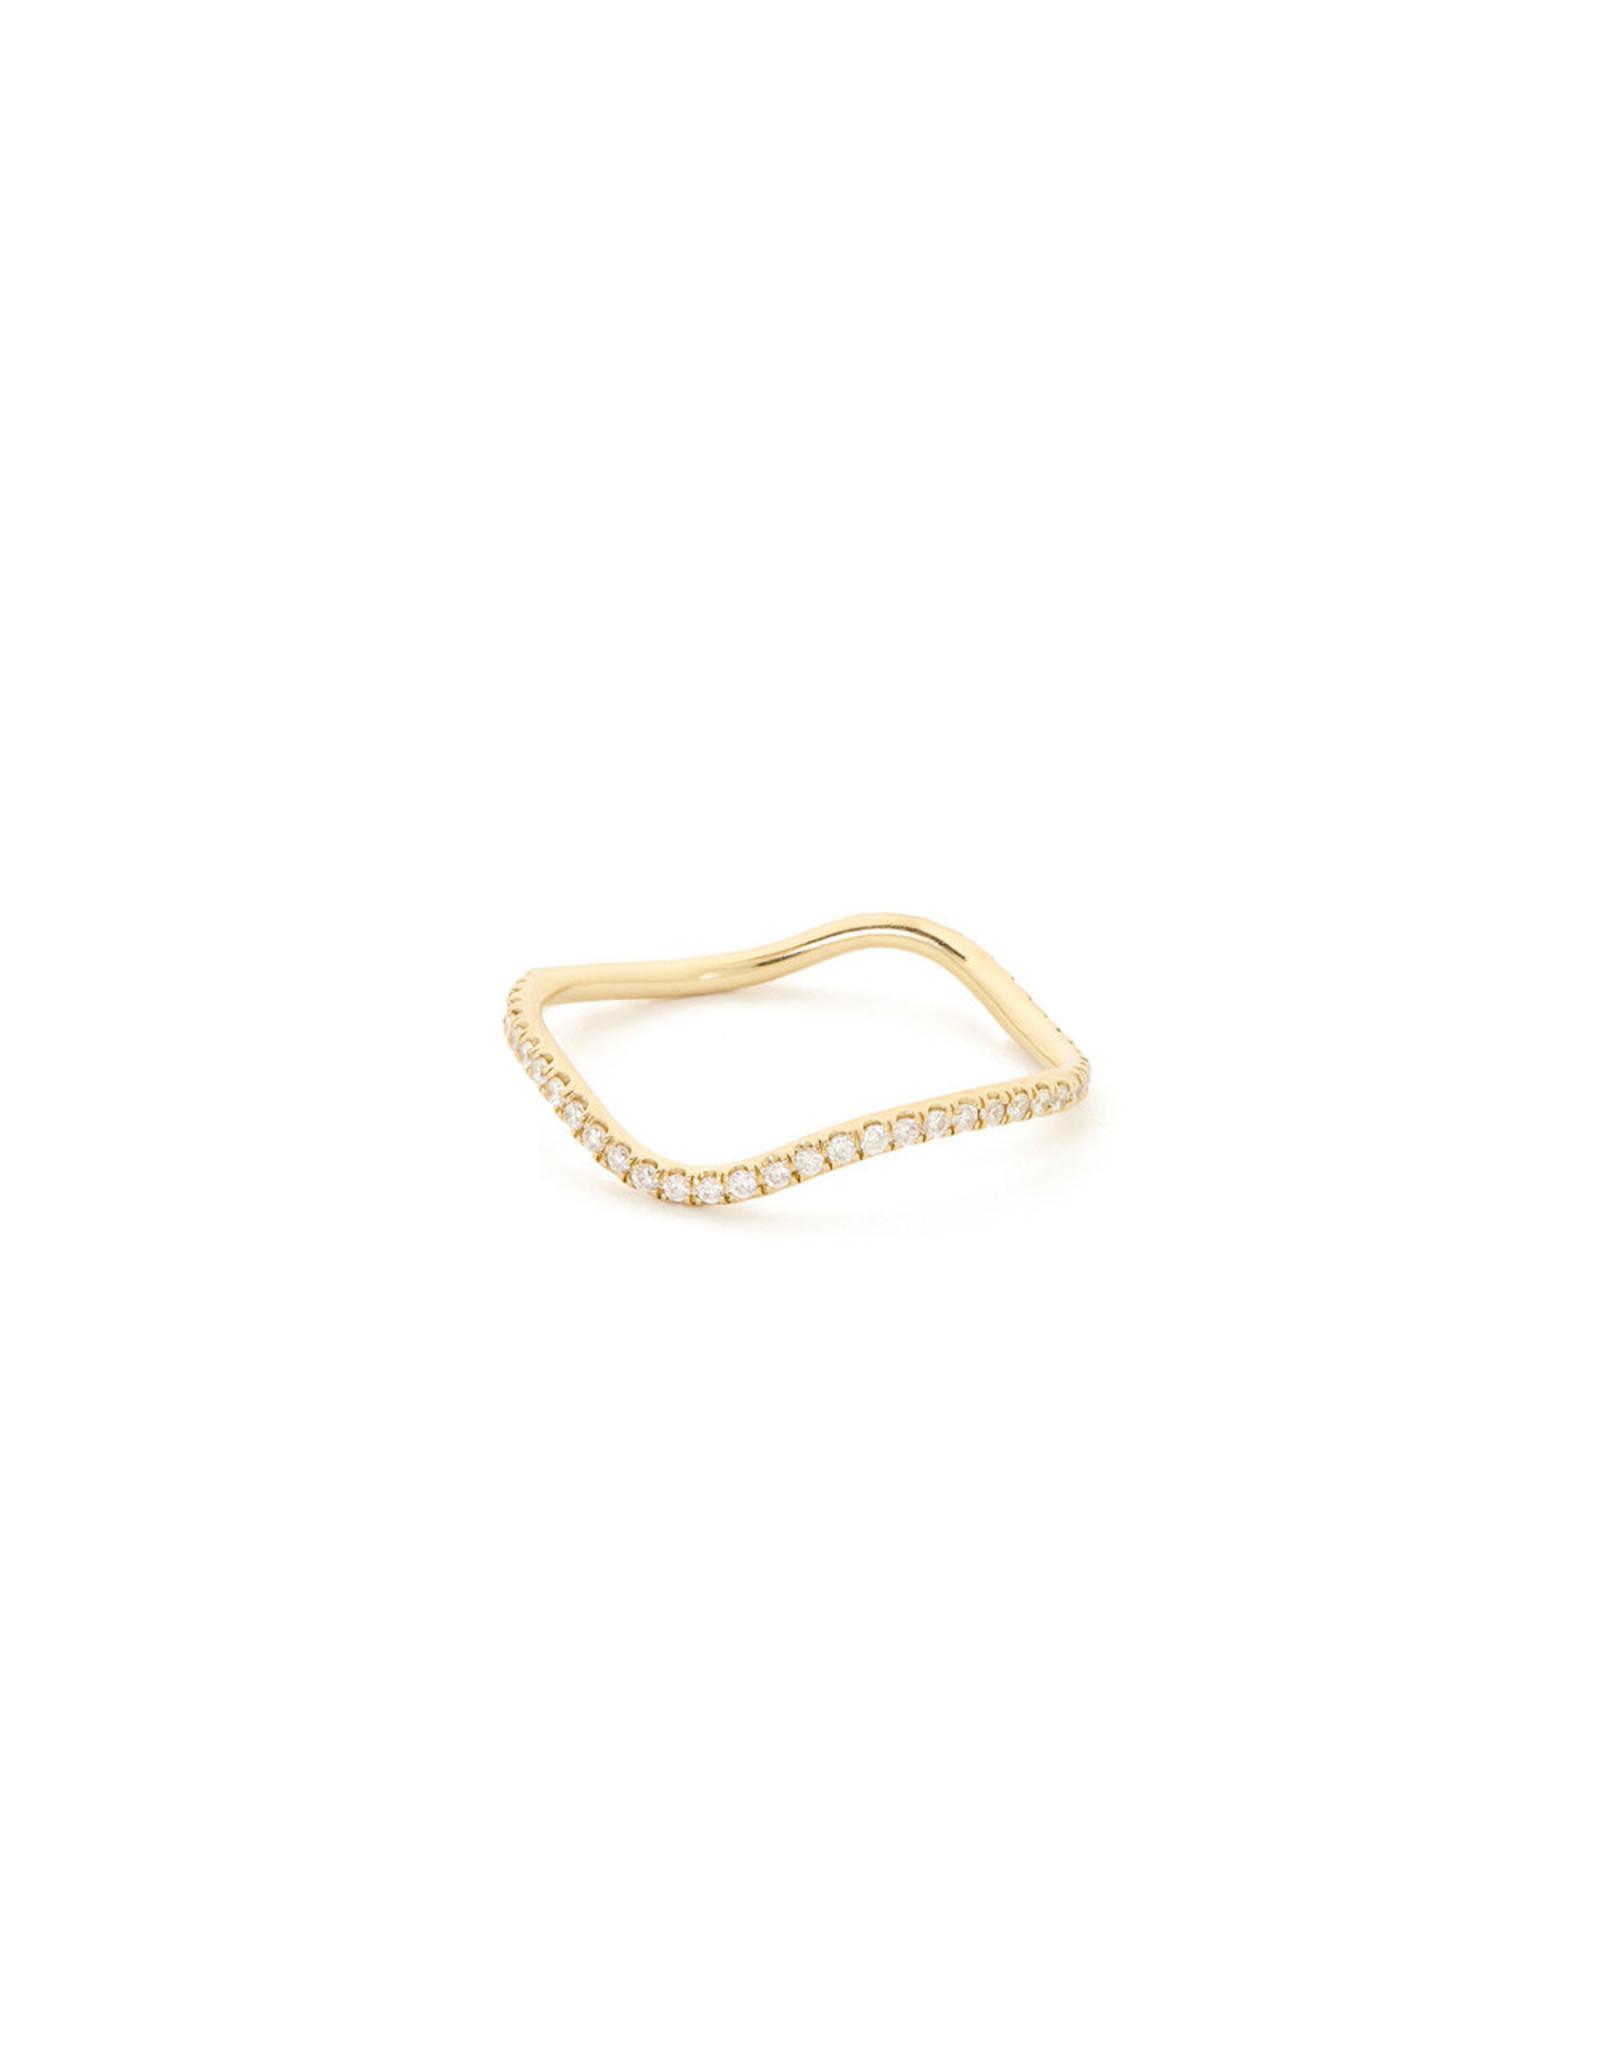 Bondeye Jewelry Bondeye Wave Diamond Eternity Band (Color: Yellow Gold, Size: 4)